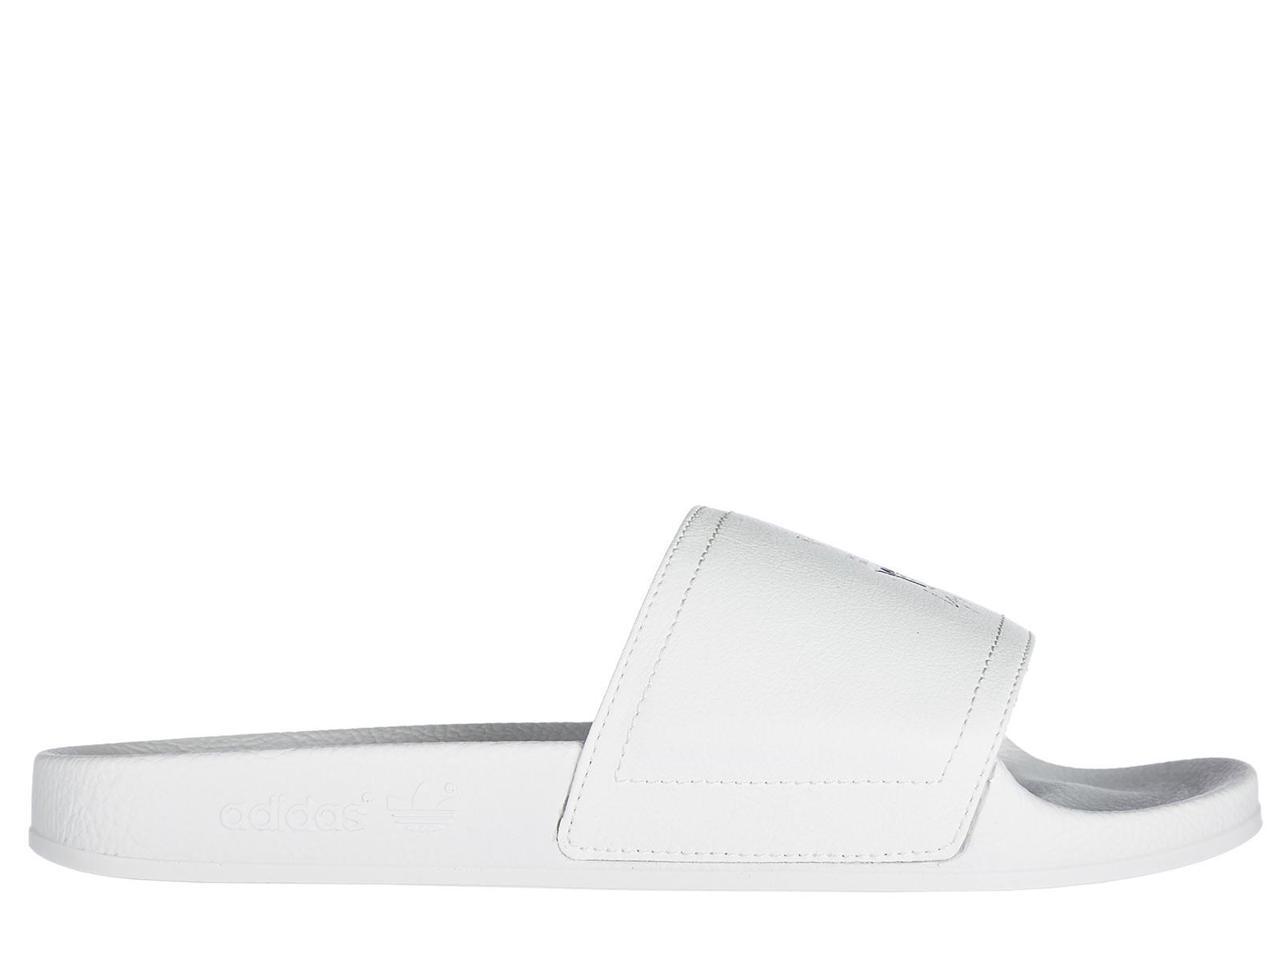 Y-3 MEN'S SLIPPERS WHITE SANDALS RUBBER  ADILETTE WHITE SLIPPERS a2529e